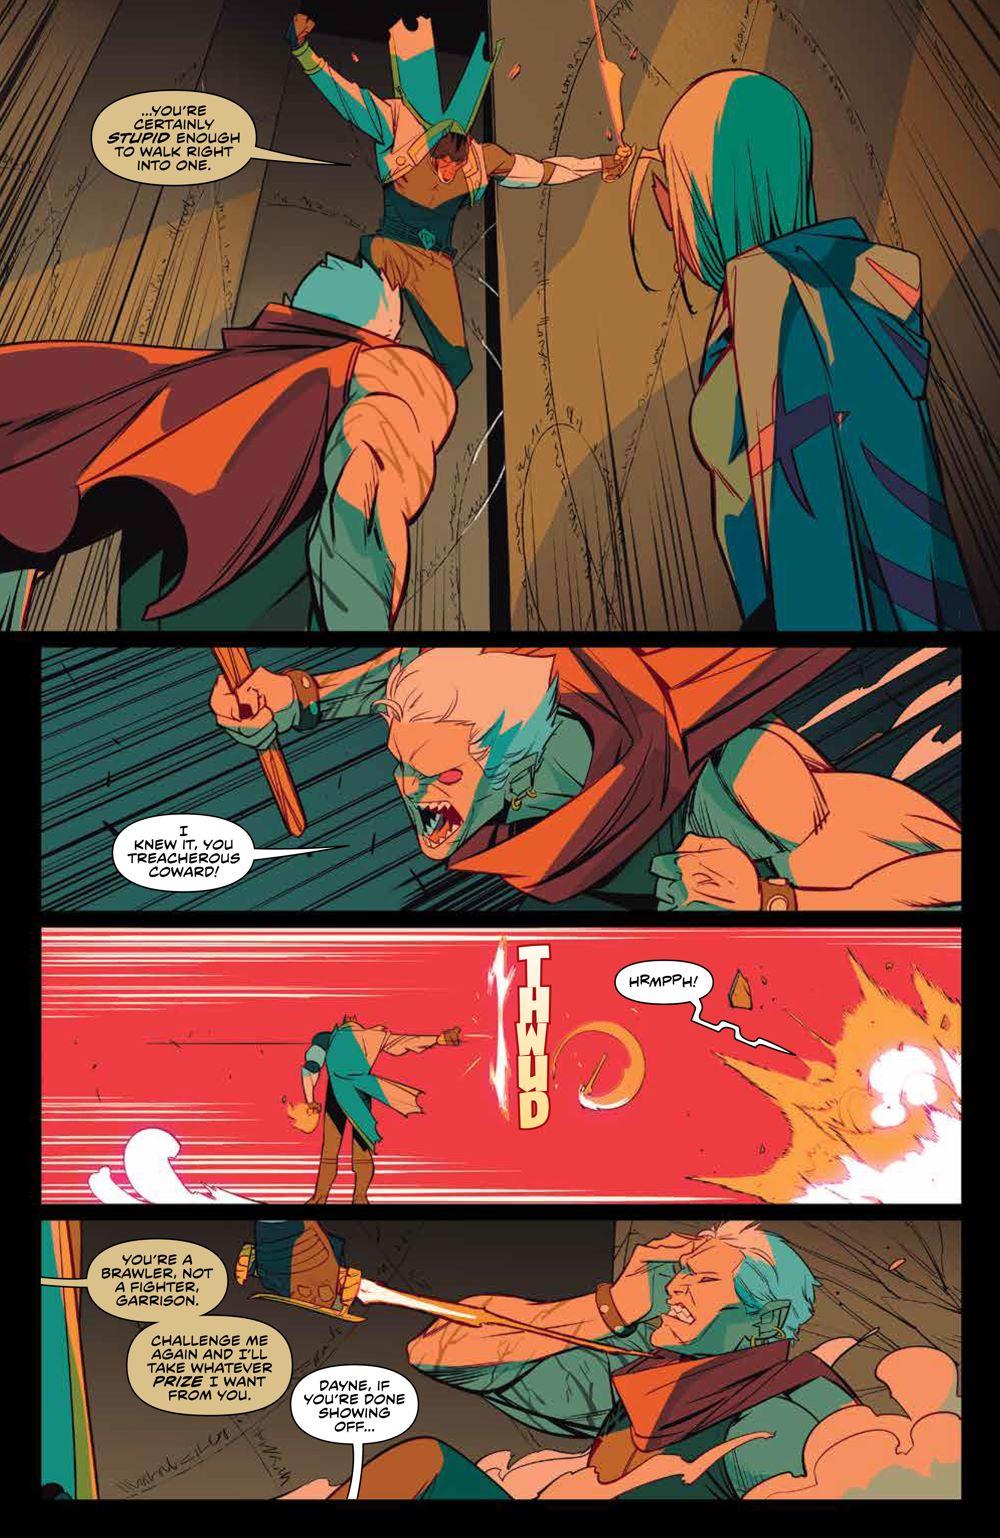 MMPR_v13_SC_PRESS_8 ComicList Previews: MIGHTY MORPHIN POWER RANGERS VOLUME 13 TP